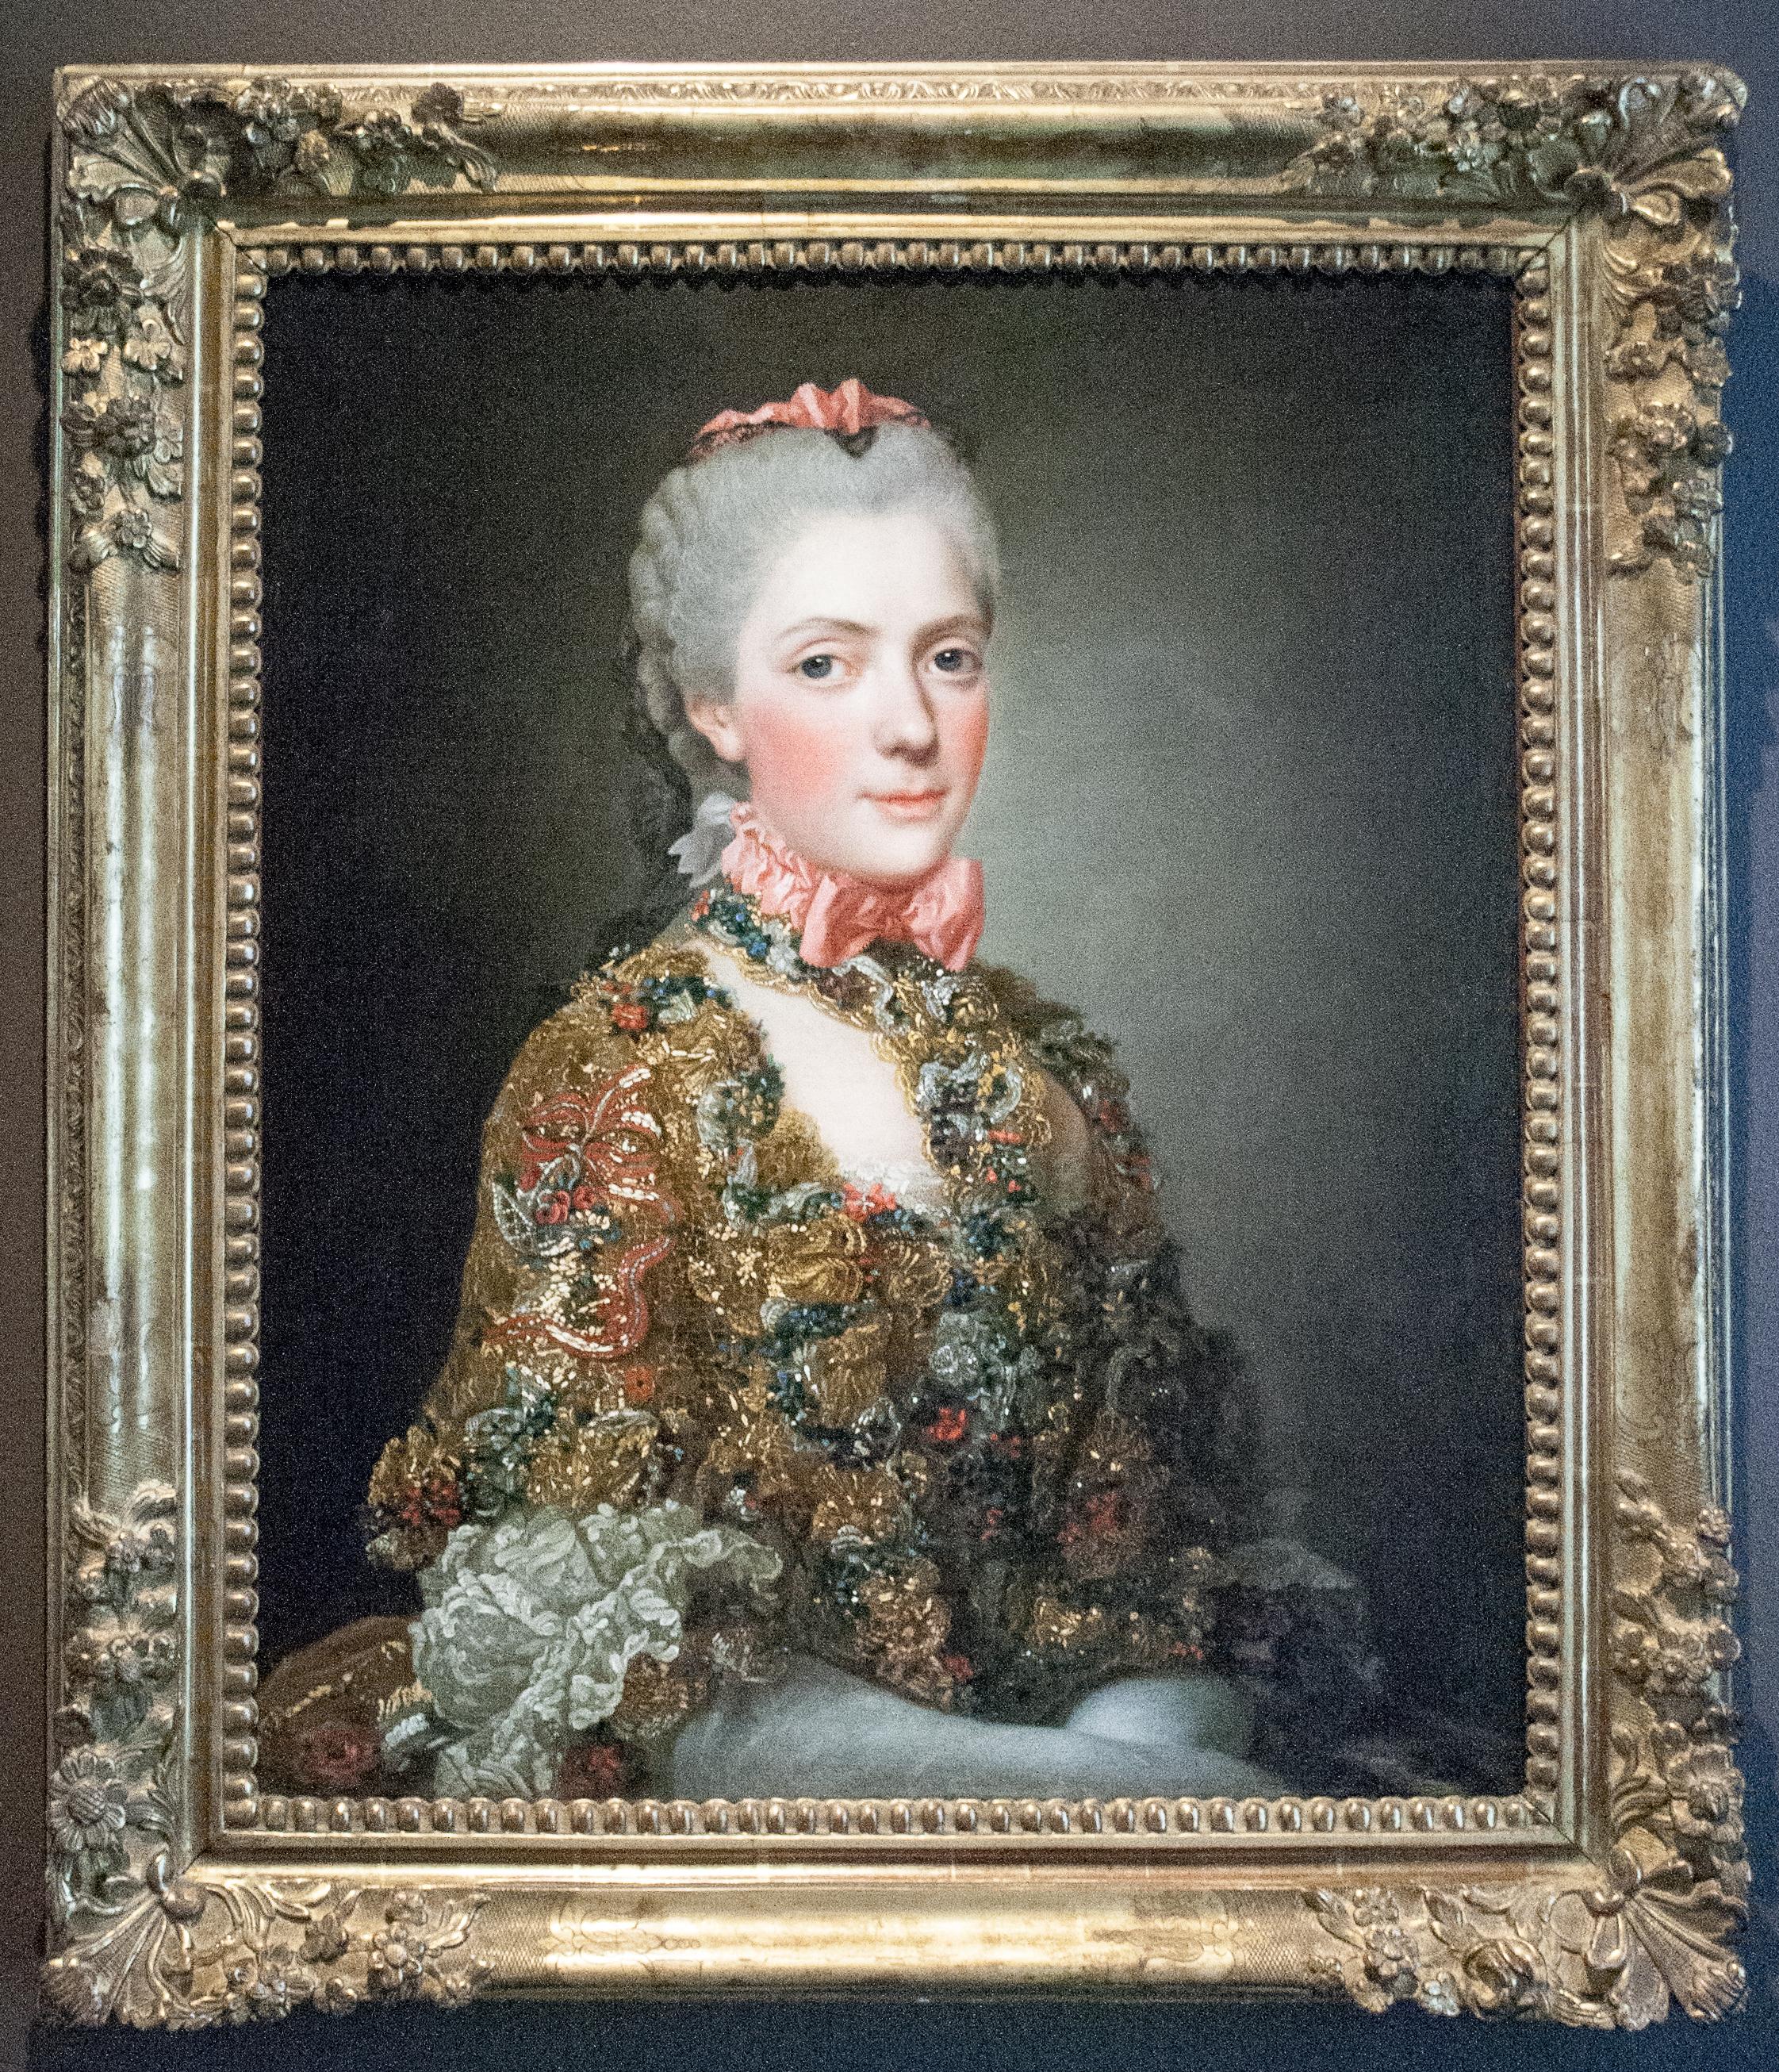 File:Roslin - Mme Adelaide (with frame).jpg - Wikimedia Commons